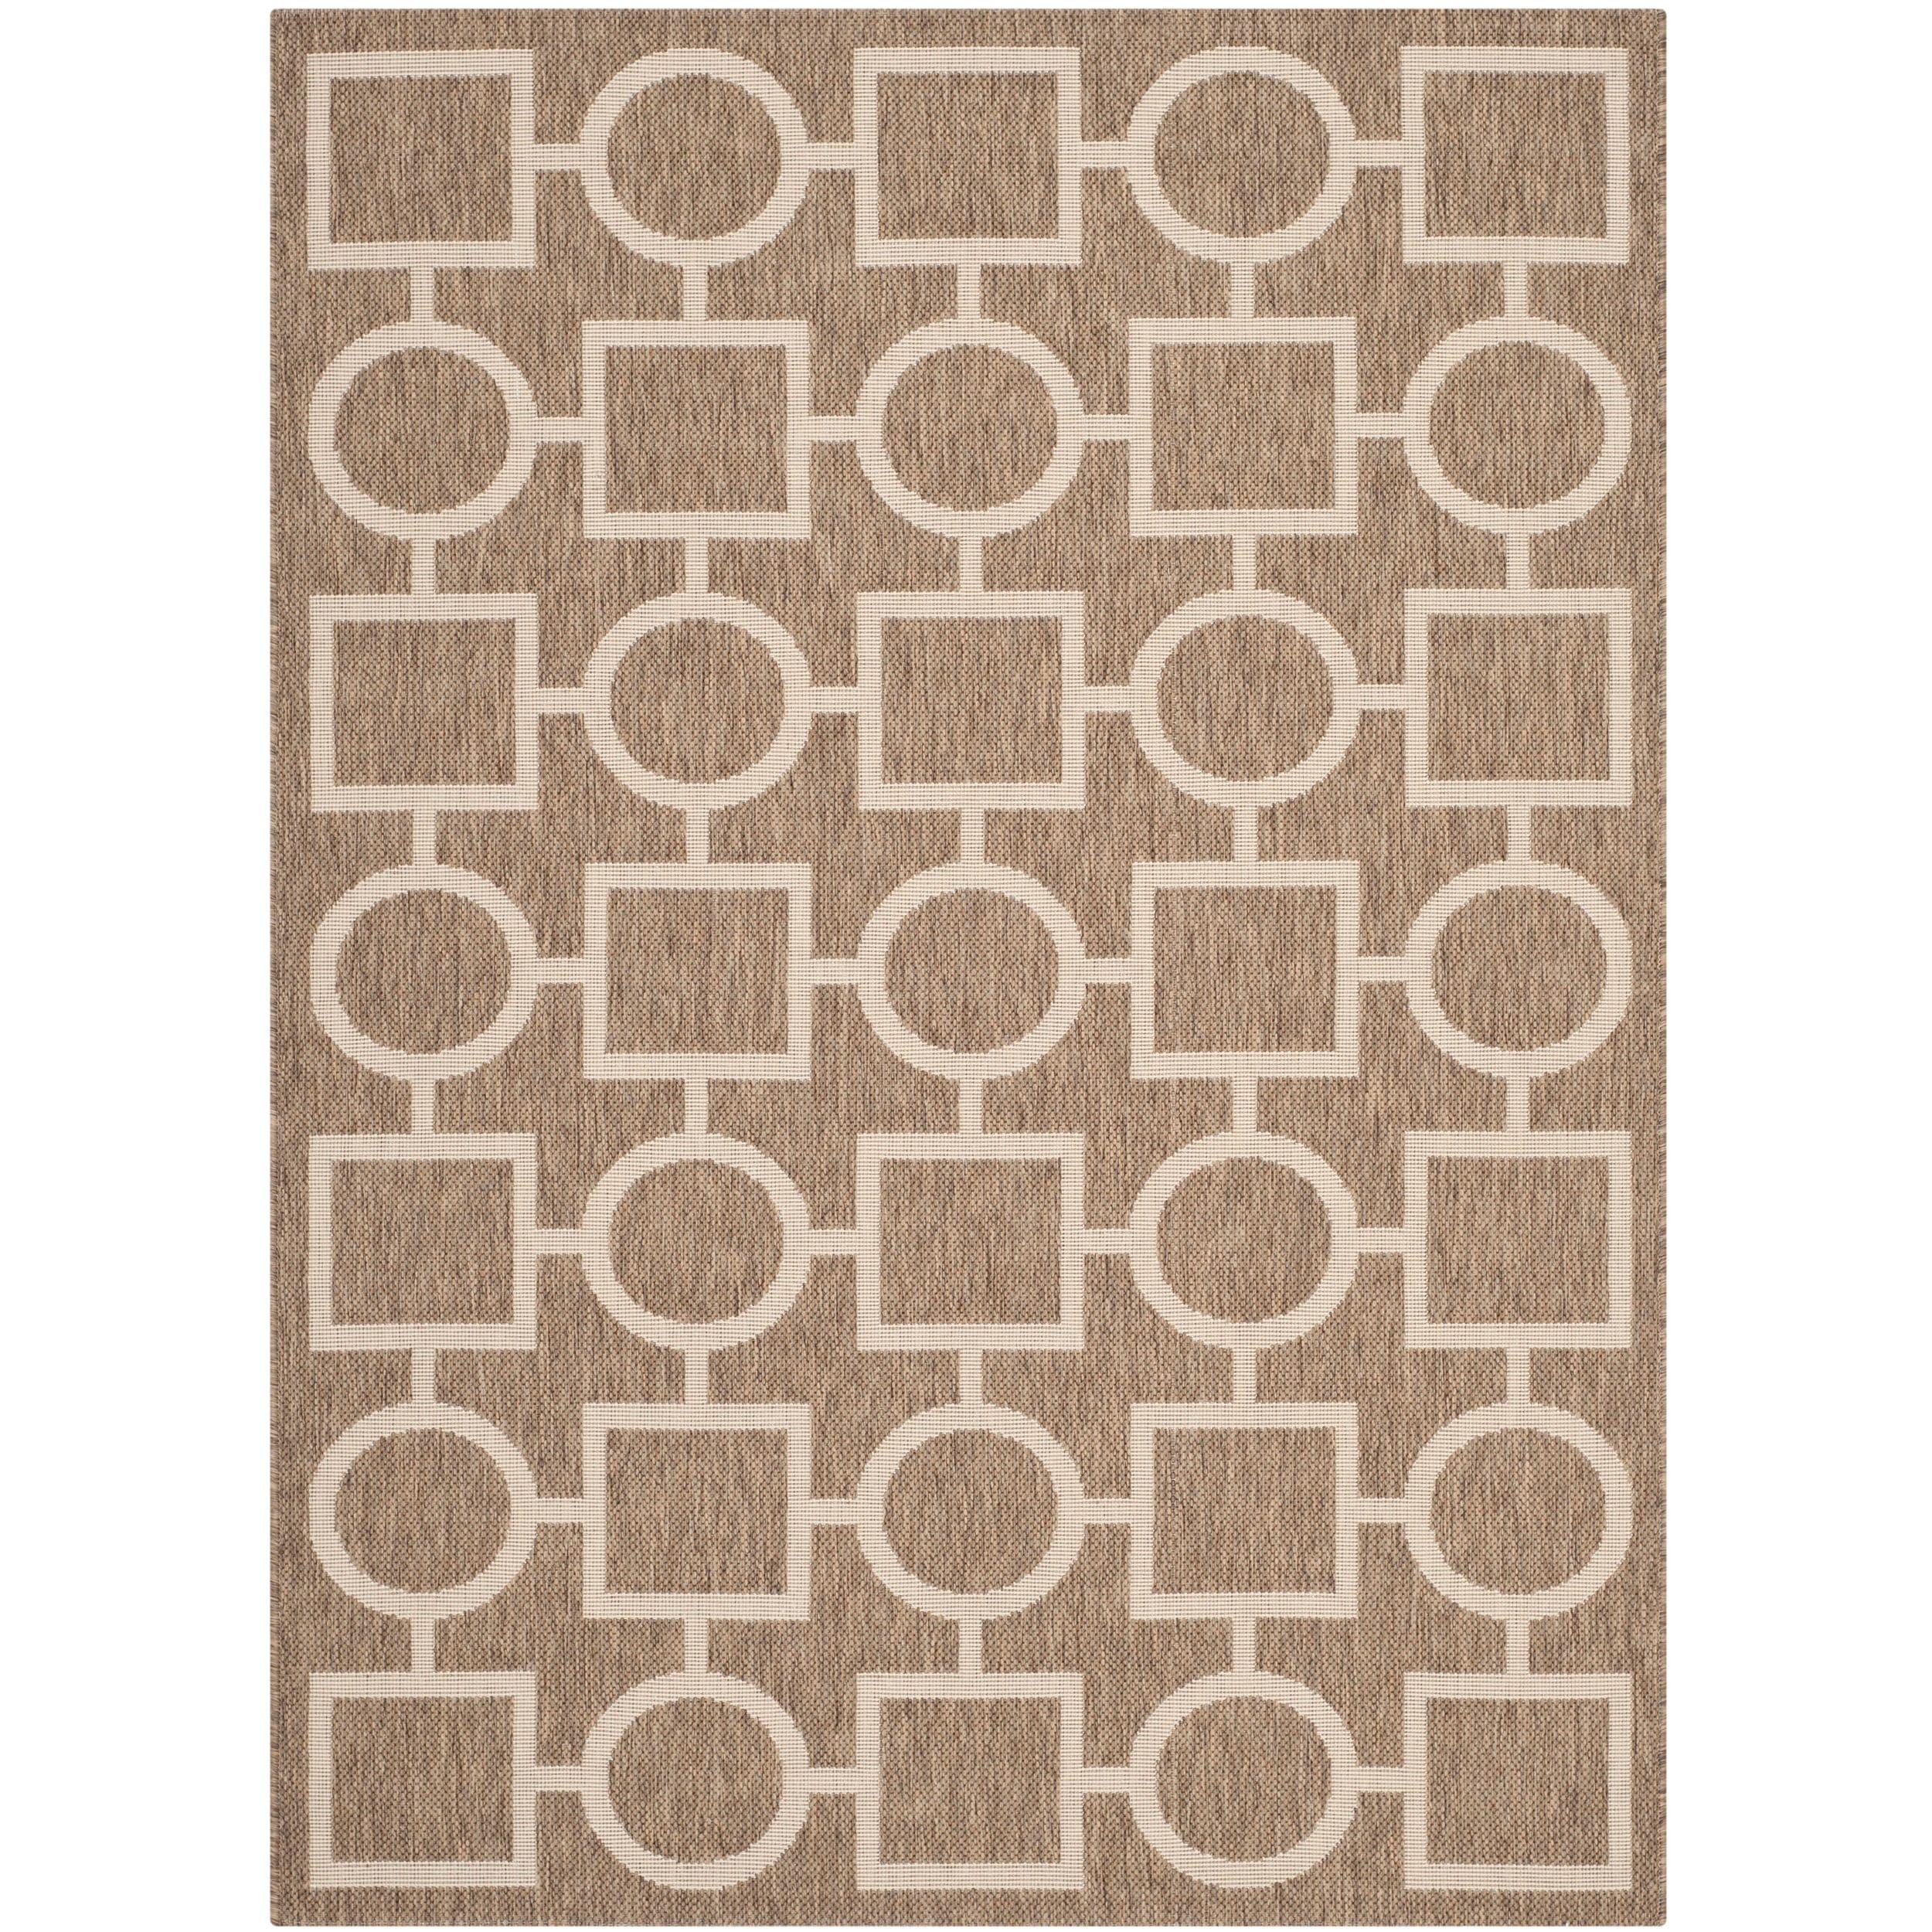 Safavieh Indoor/ Outdoor Courtyard Brown/ Bone Rug With .25 inch Pile (4 X 57)